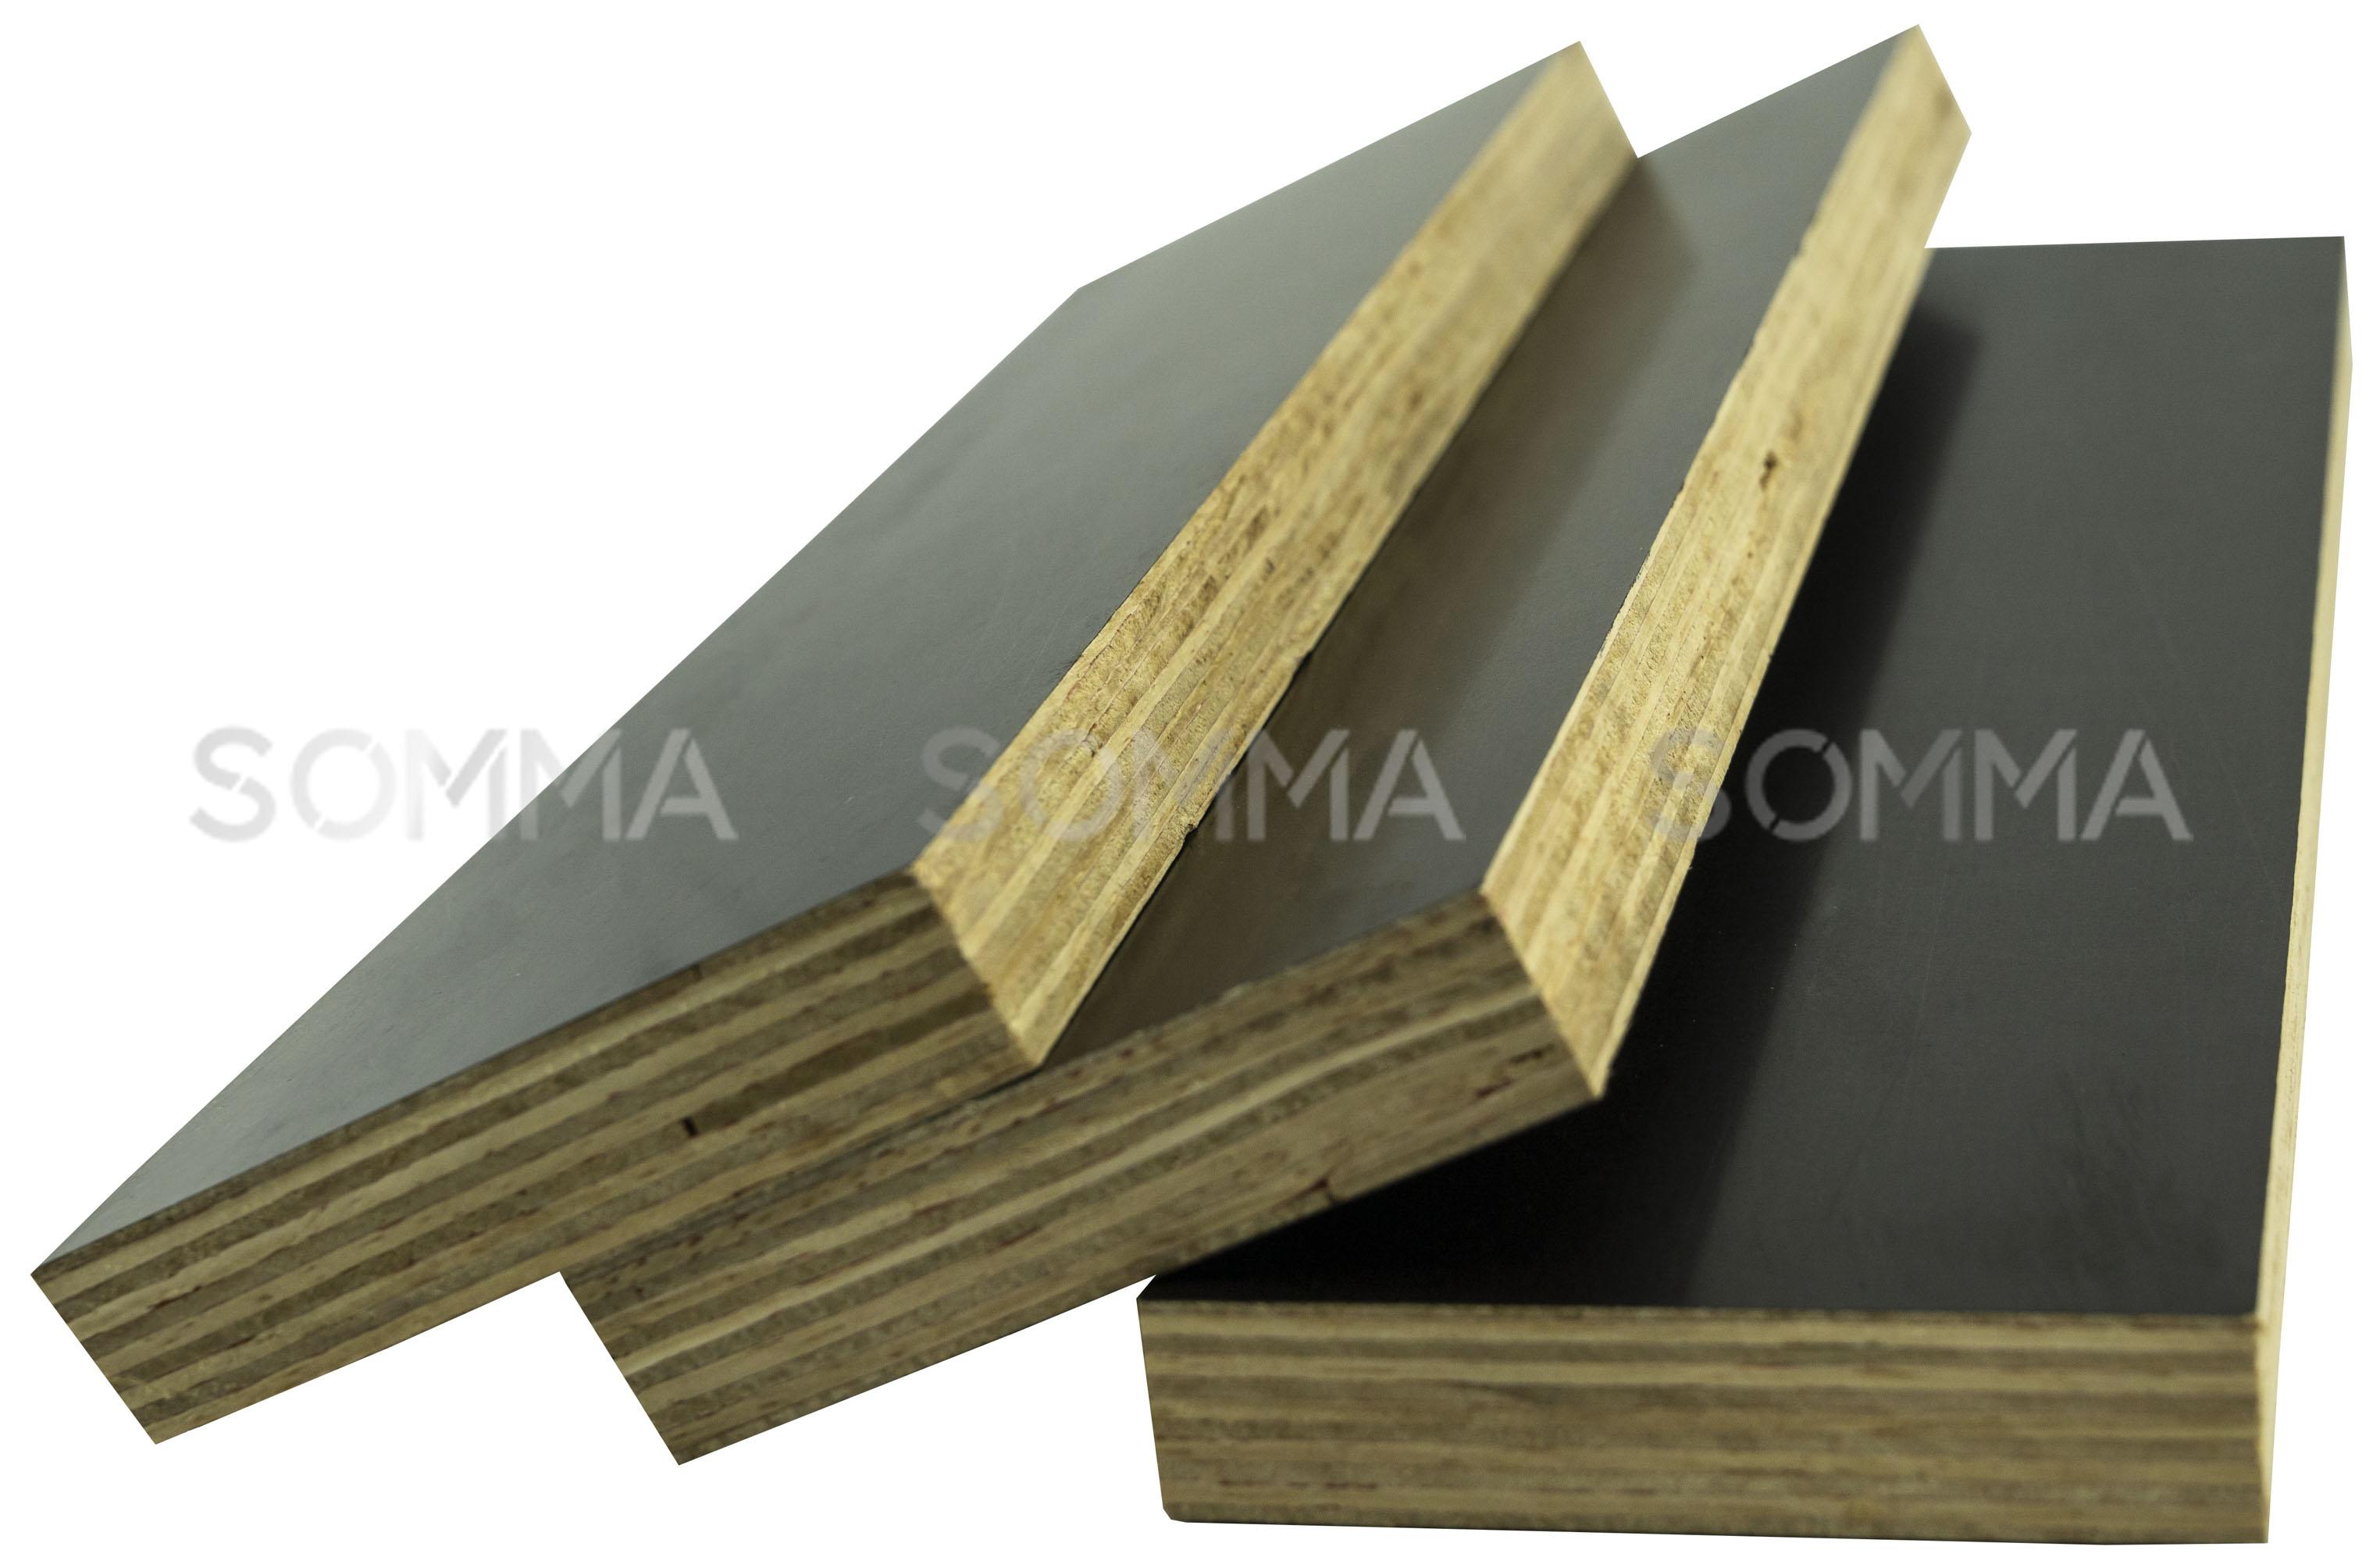 Somma plywood formwork